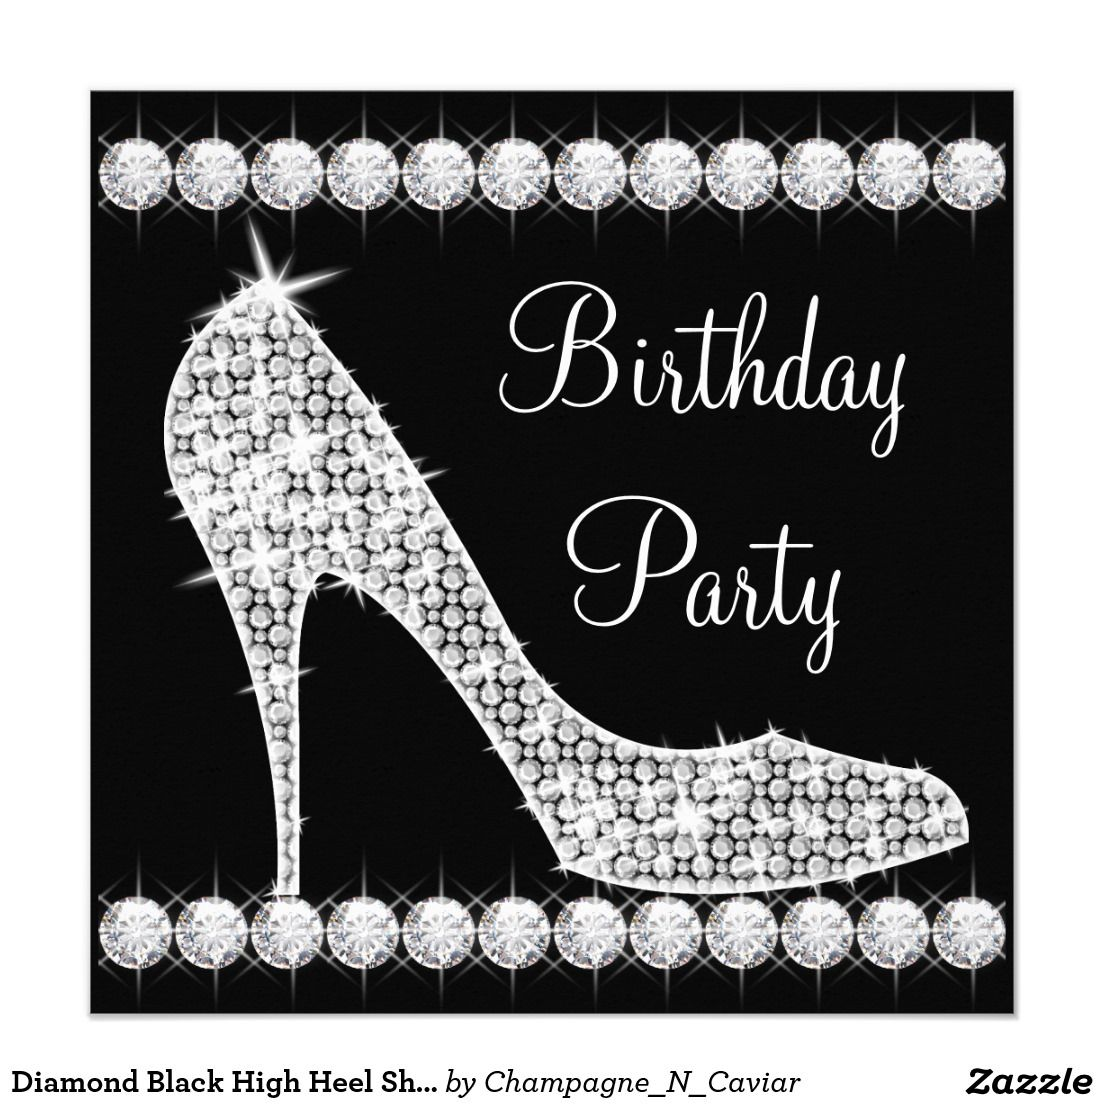 Diamond Black High Heel Shoe Birthday Party Invitation | Pinterest ...